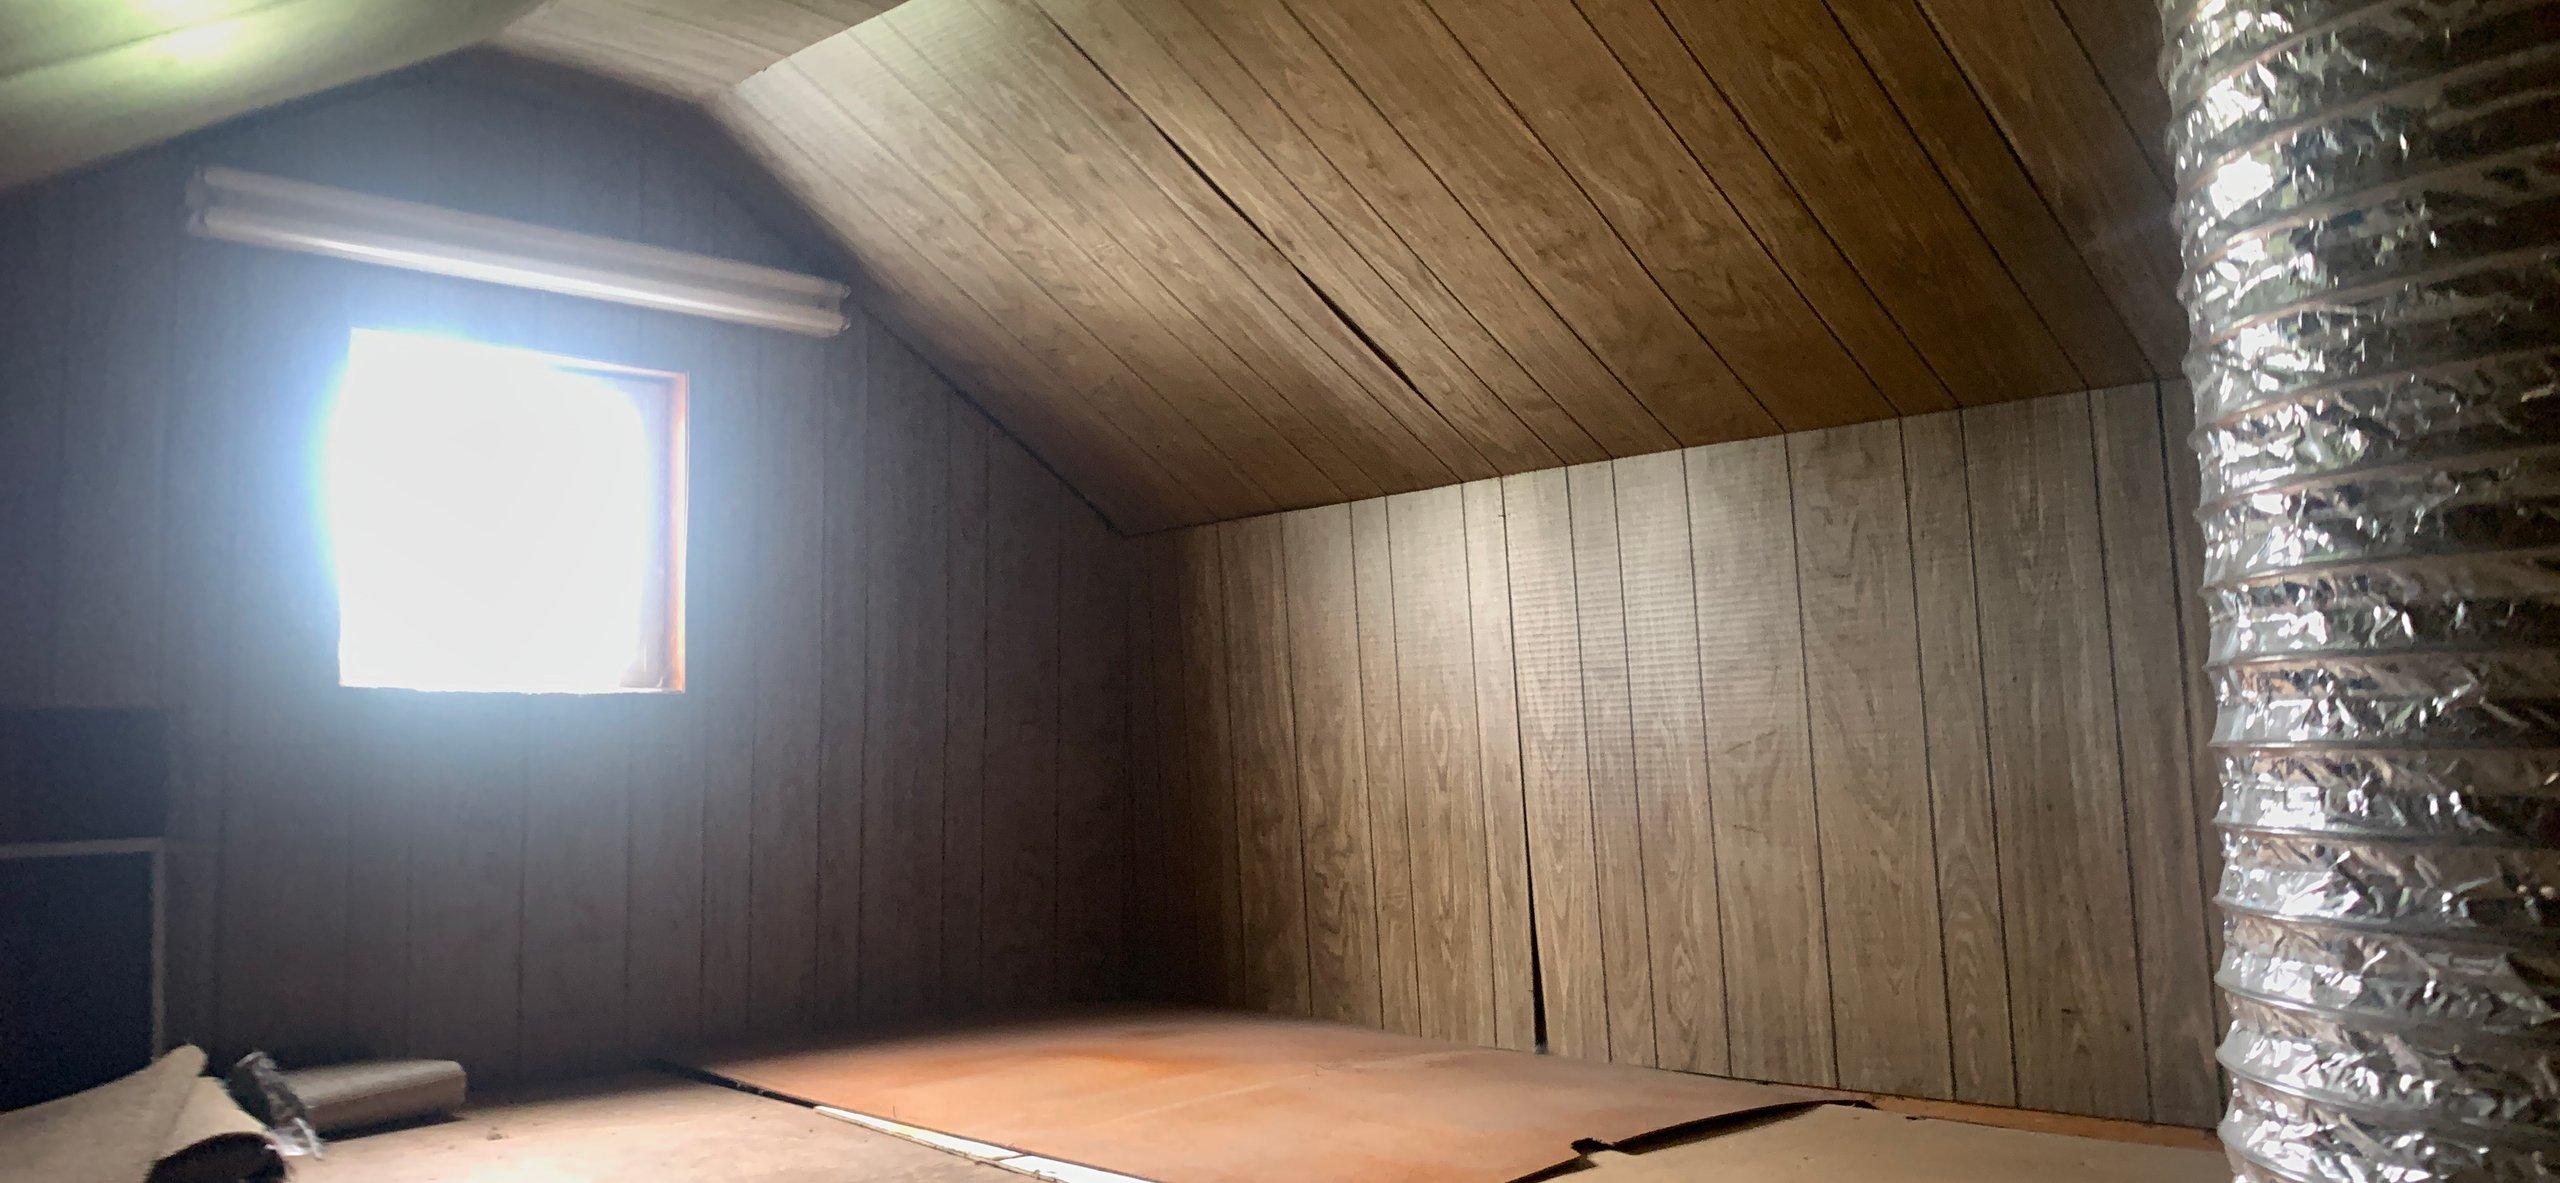 20x12 Attic self storage unit